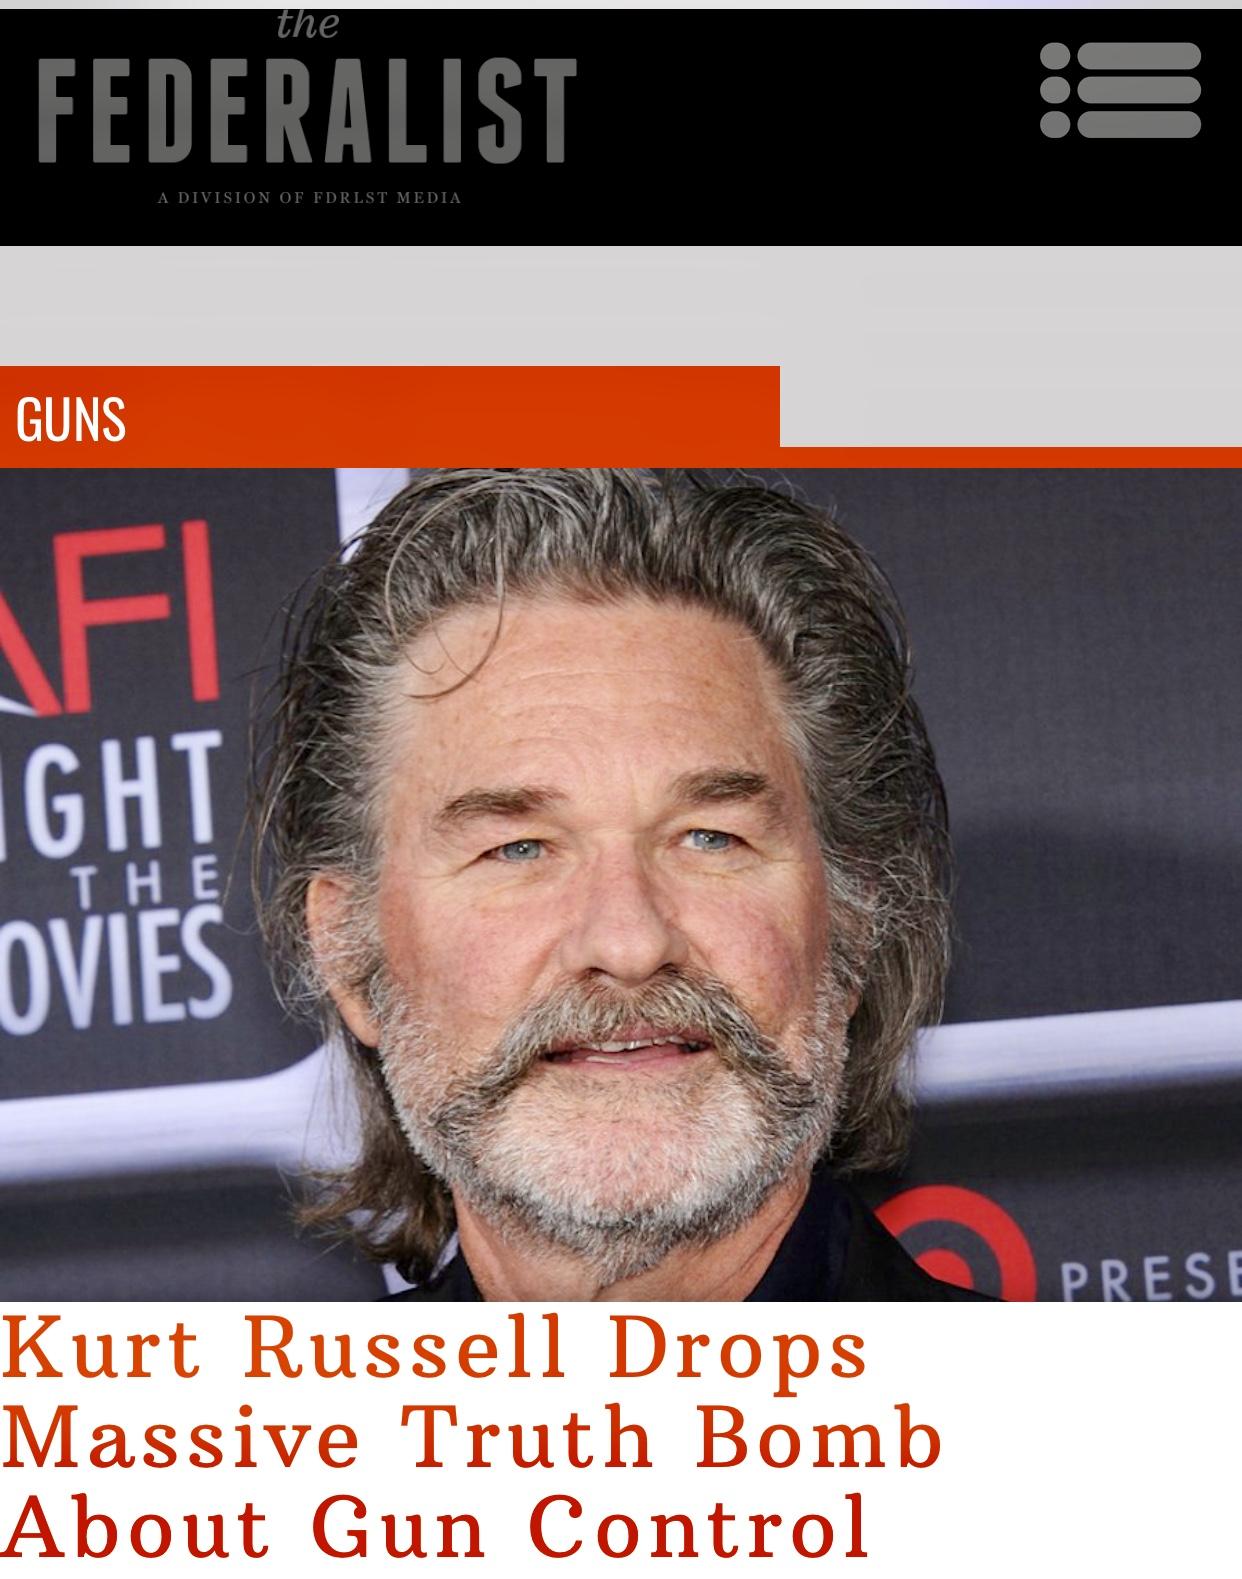 Kurt Russell Drops Massive Truth Bomb About Gun Control